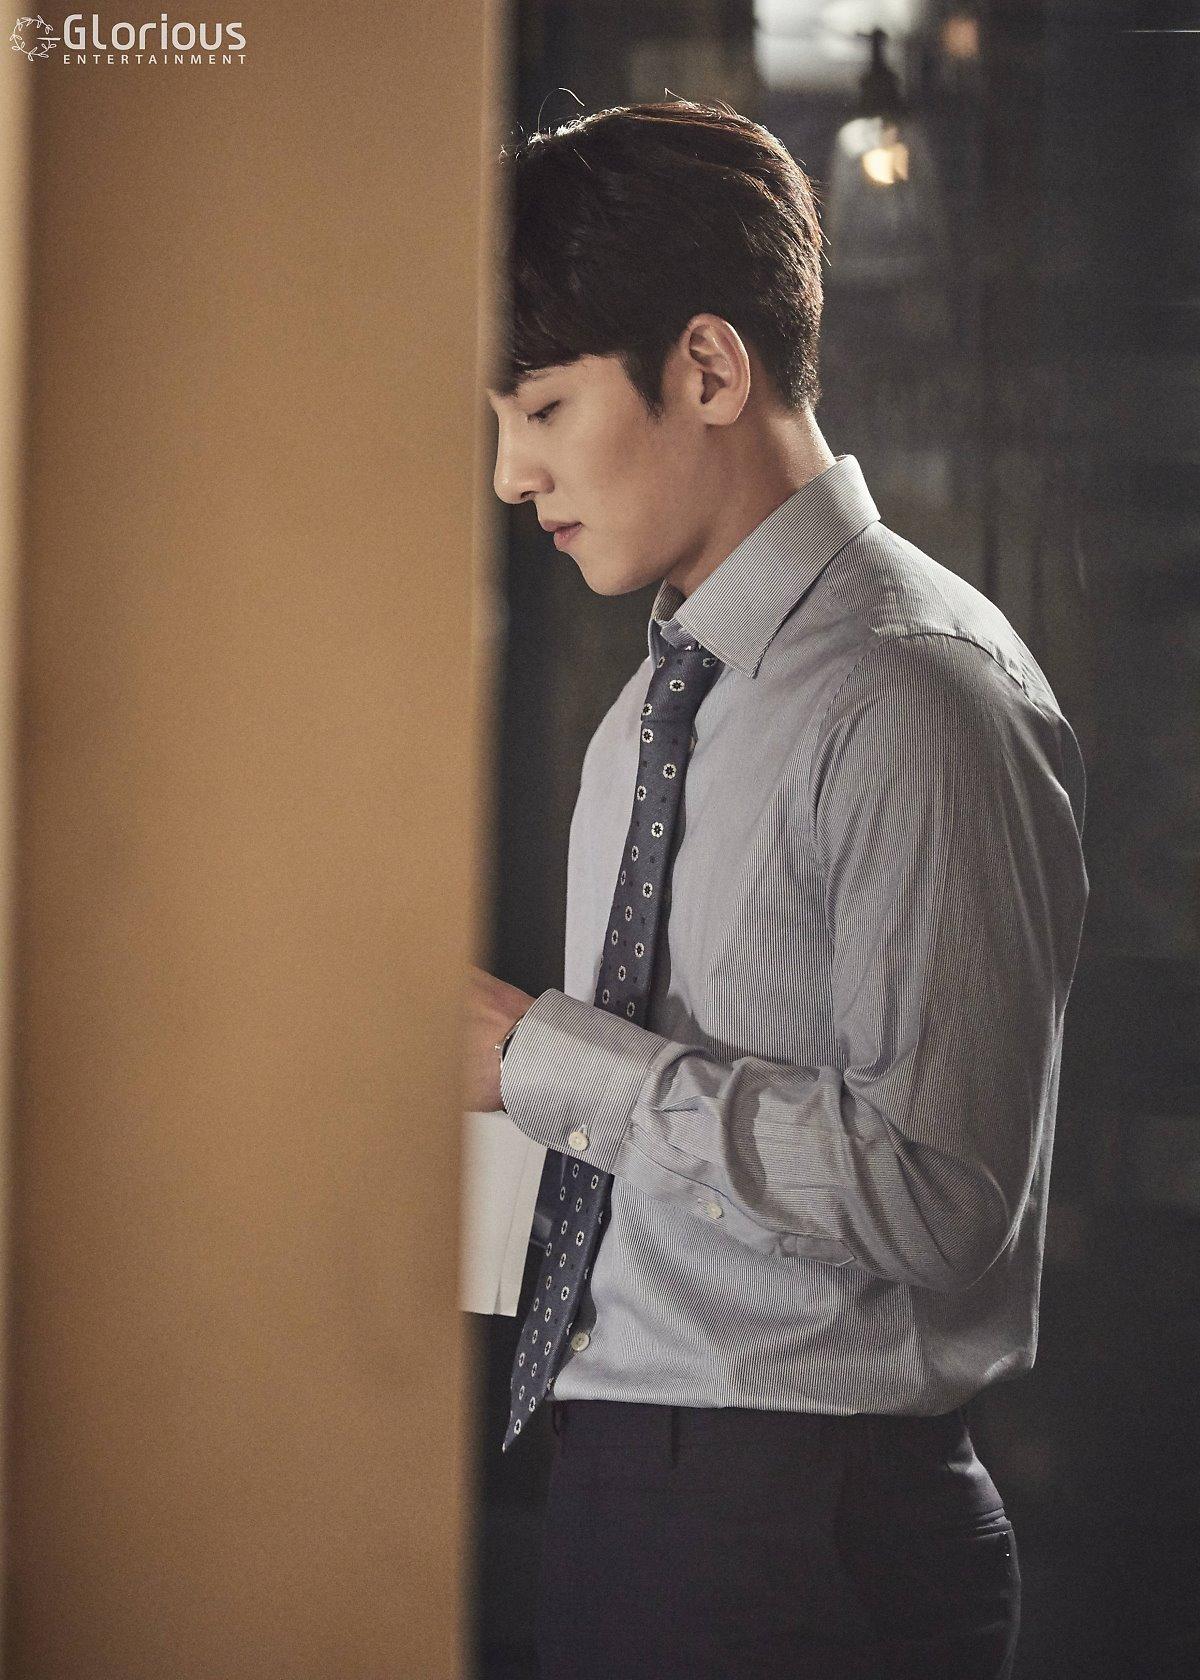 kitchen updates undermount white sink [drama] ji chang wook reveals his 'suspicious house' life ...